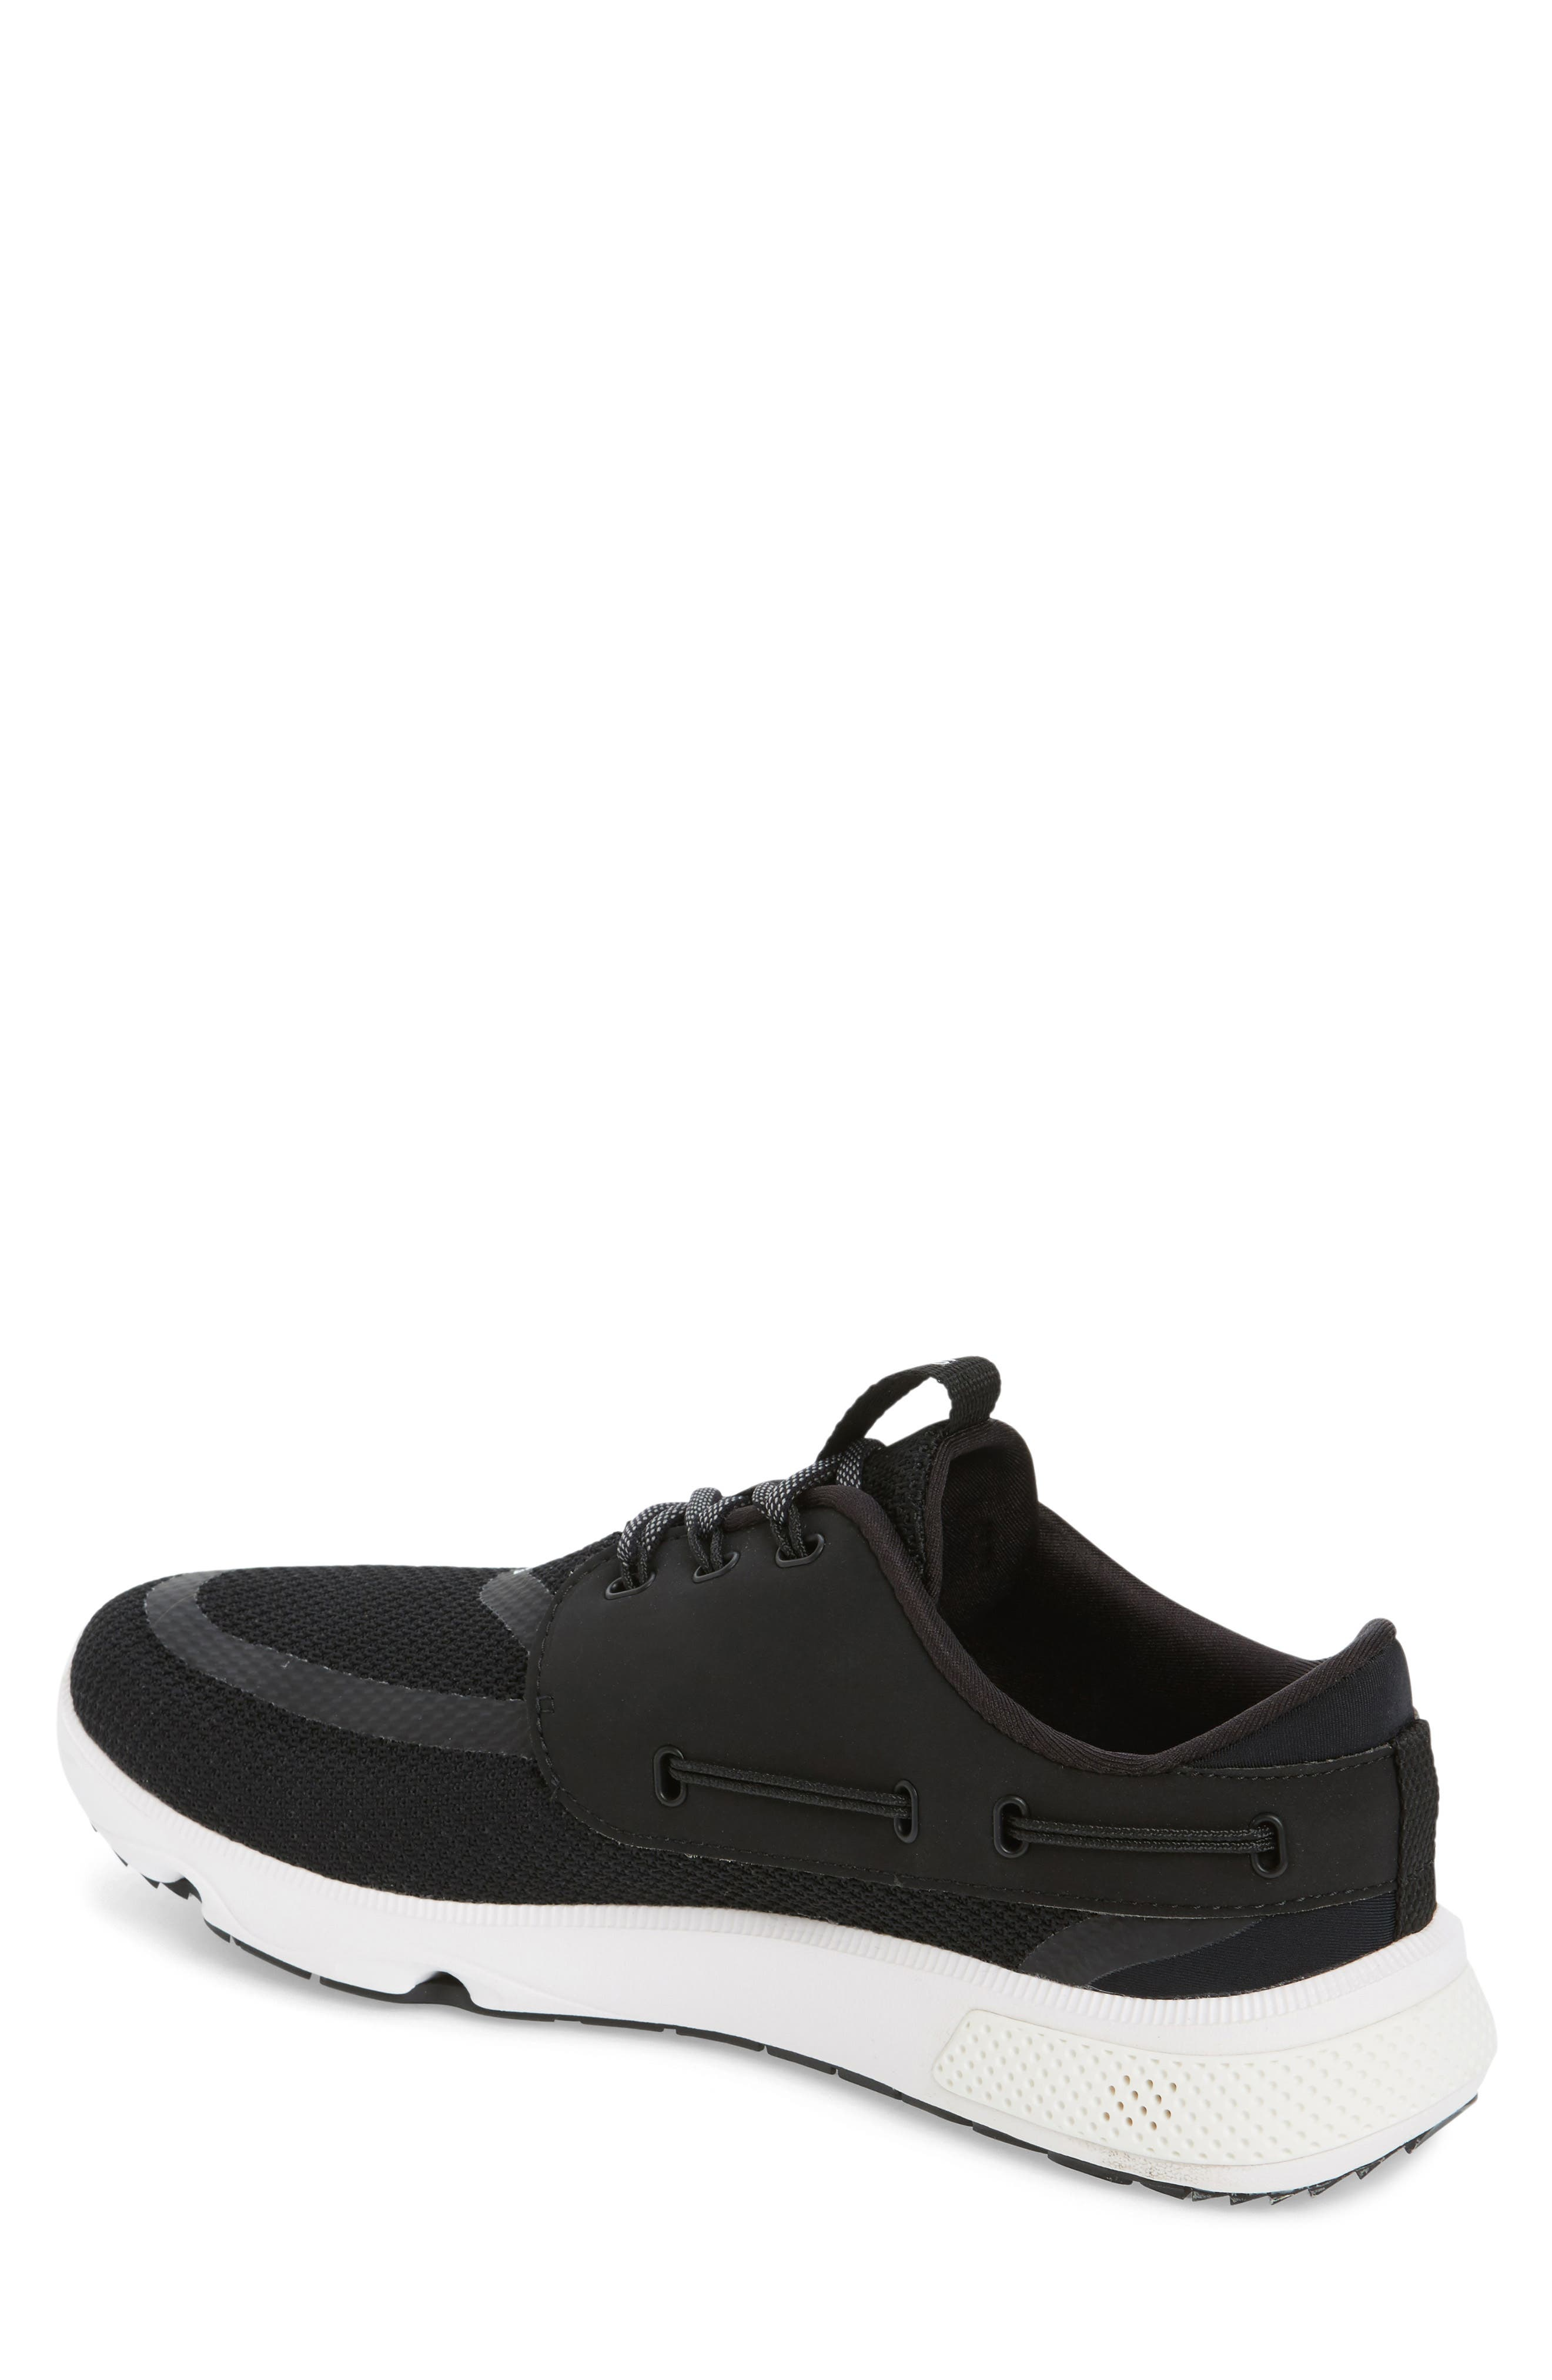 7 Seas Sneaker,                             Alternate thumbnail 2, color,                             001